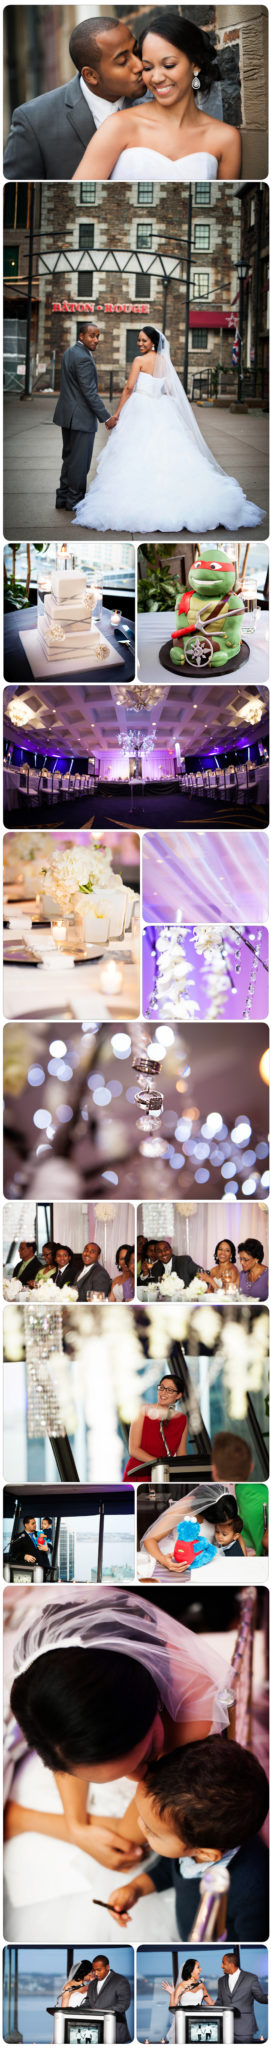 winter_wedding_reception